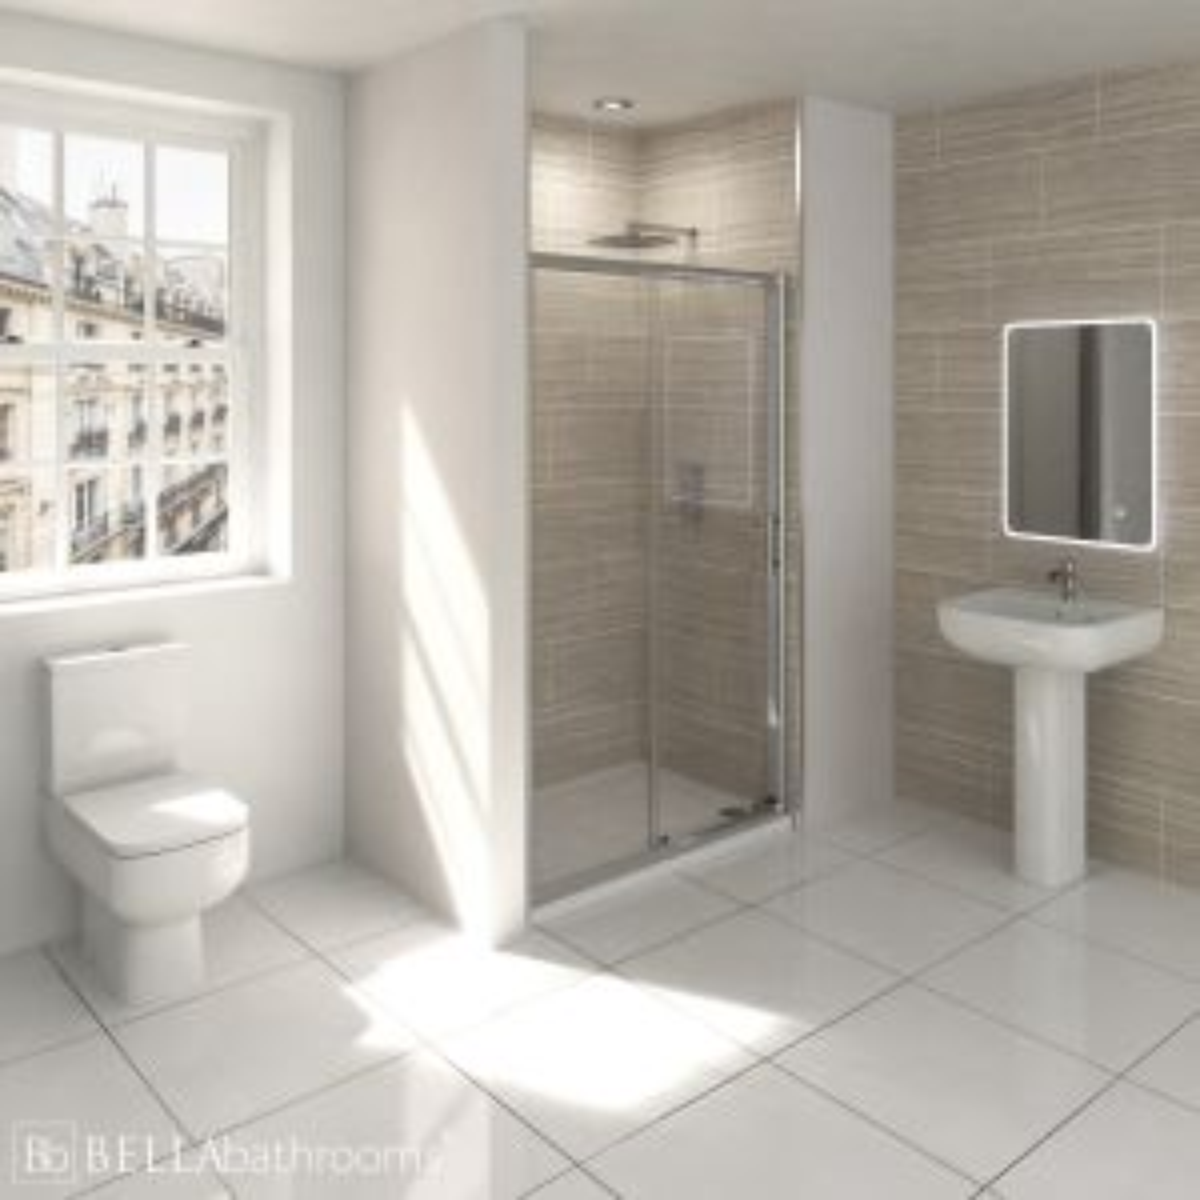 RAK Series 600 En-Suite Bathroom with Pacific Sliding Shower Enclosure Recess